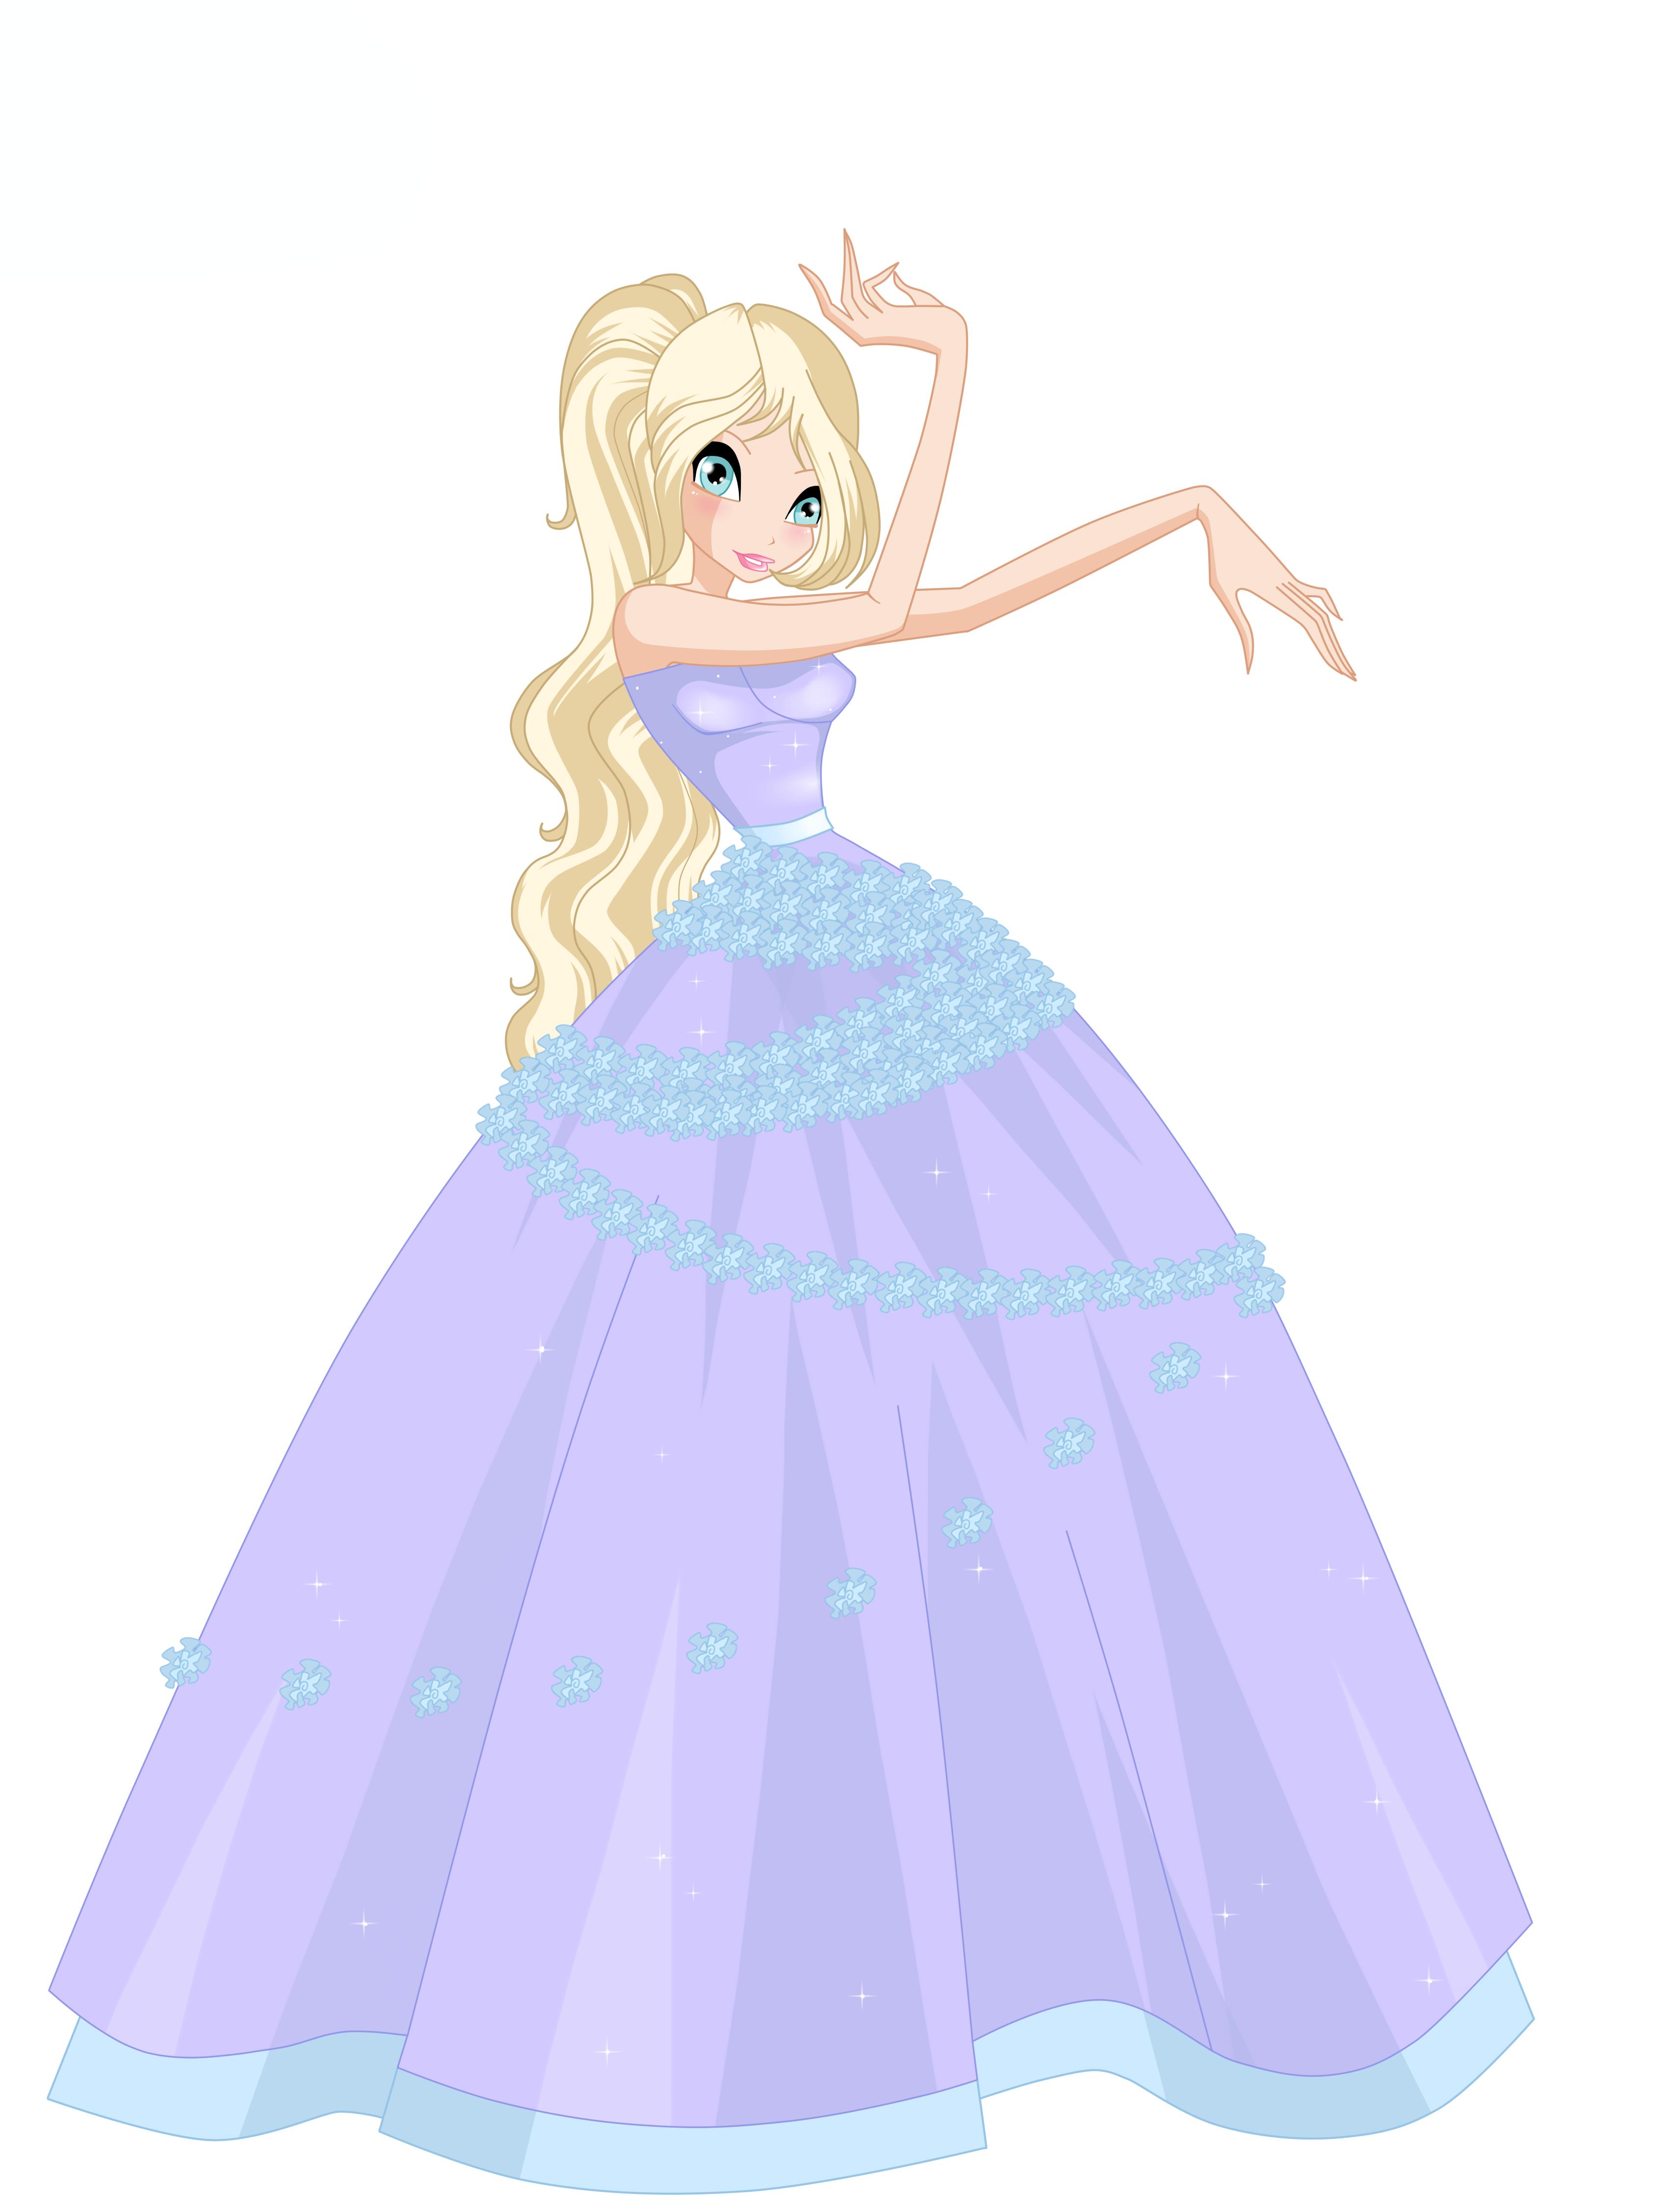 Raurine Flower princess ball gown request by Woogyuxi on DeviantArt